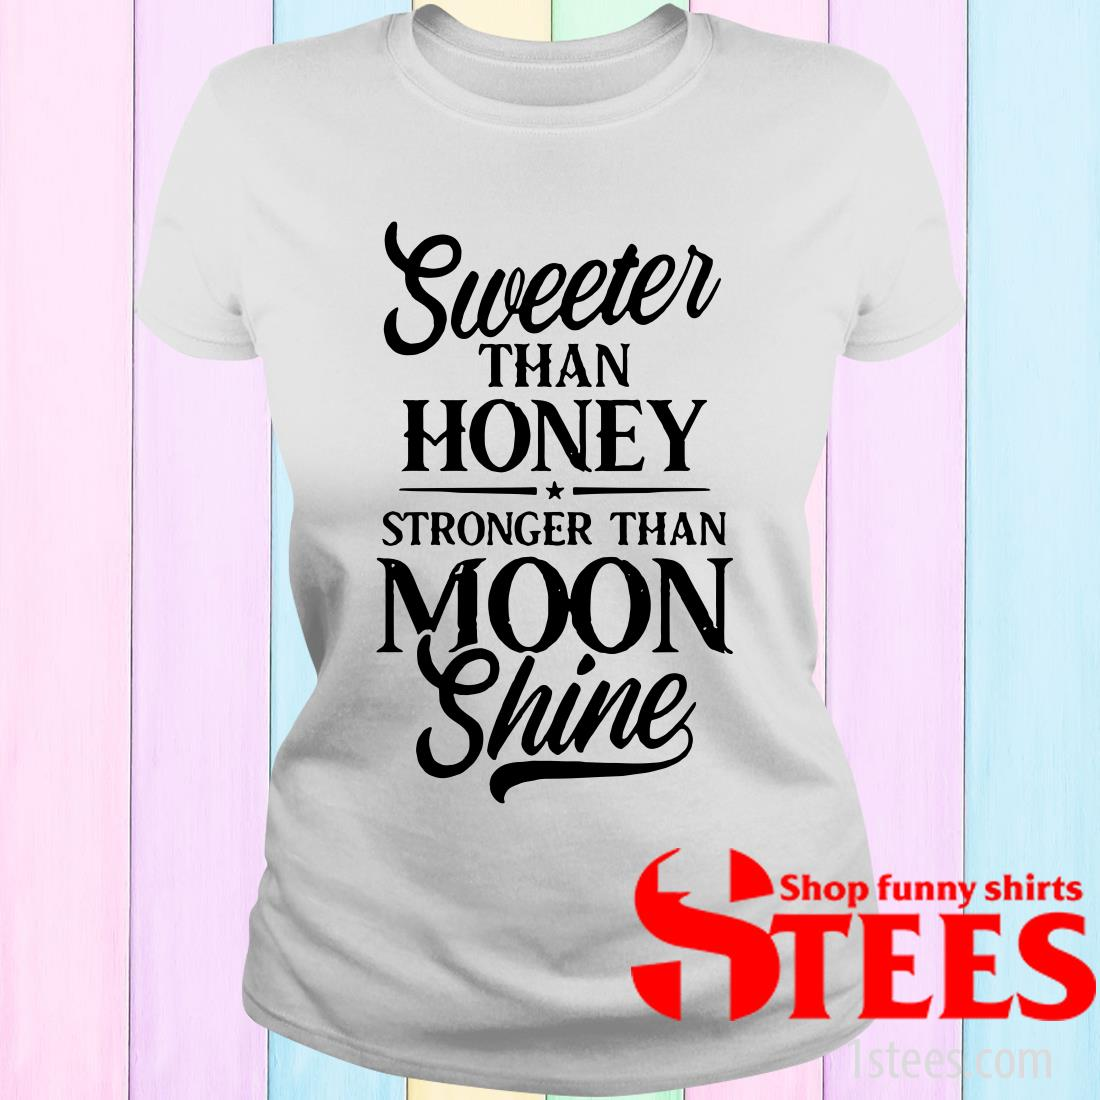 Sweeter Than Honey Stronger Than Moon Shine Women's T-Shirt